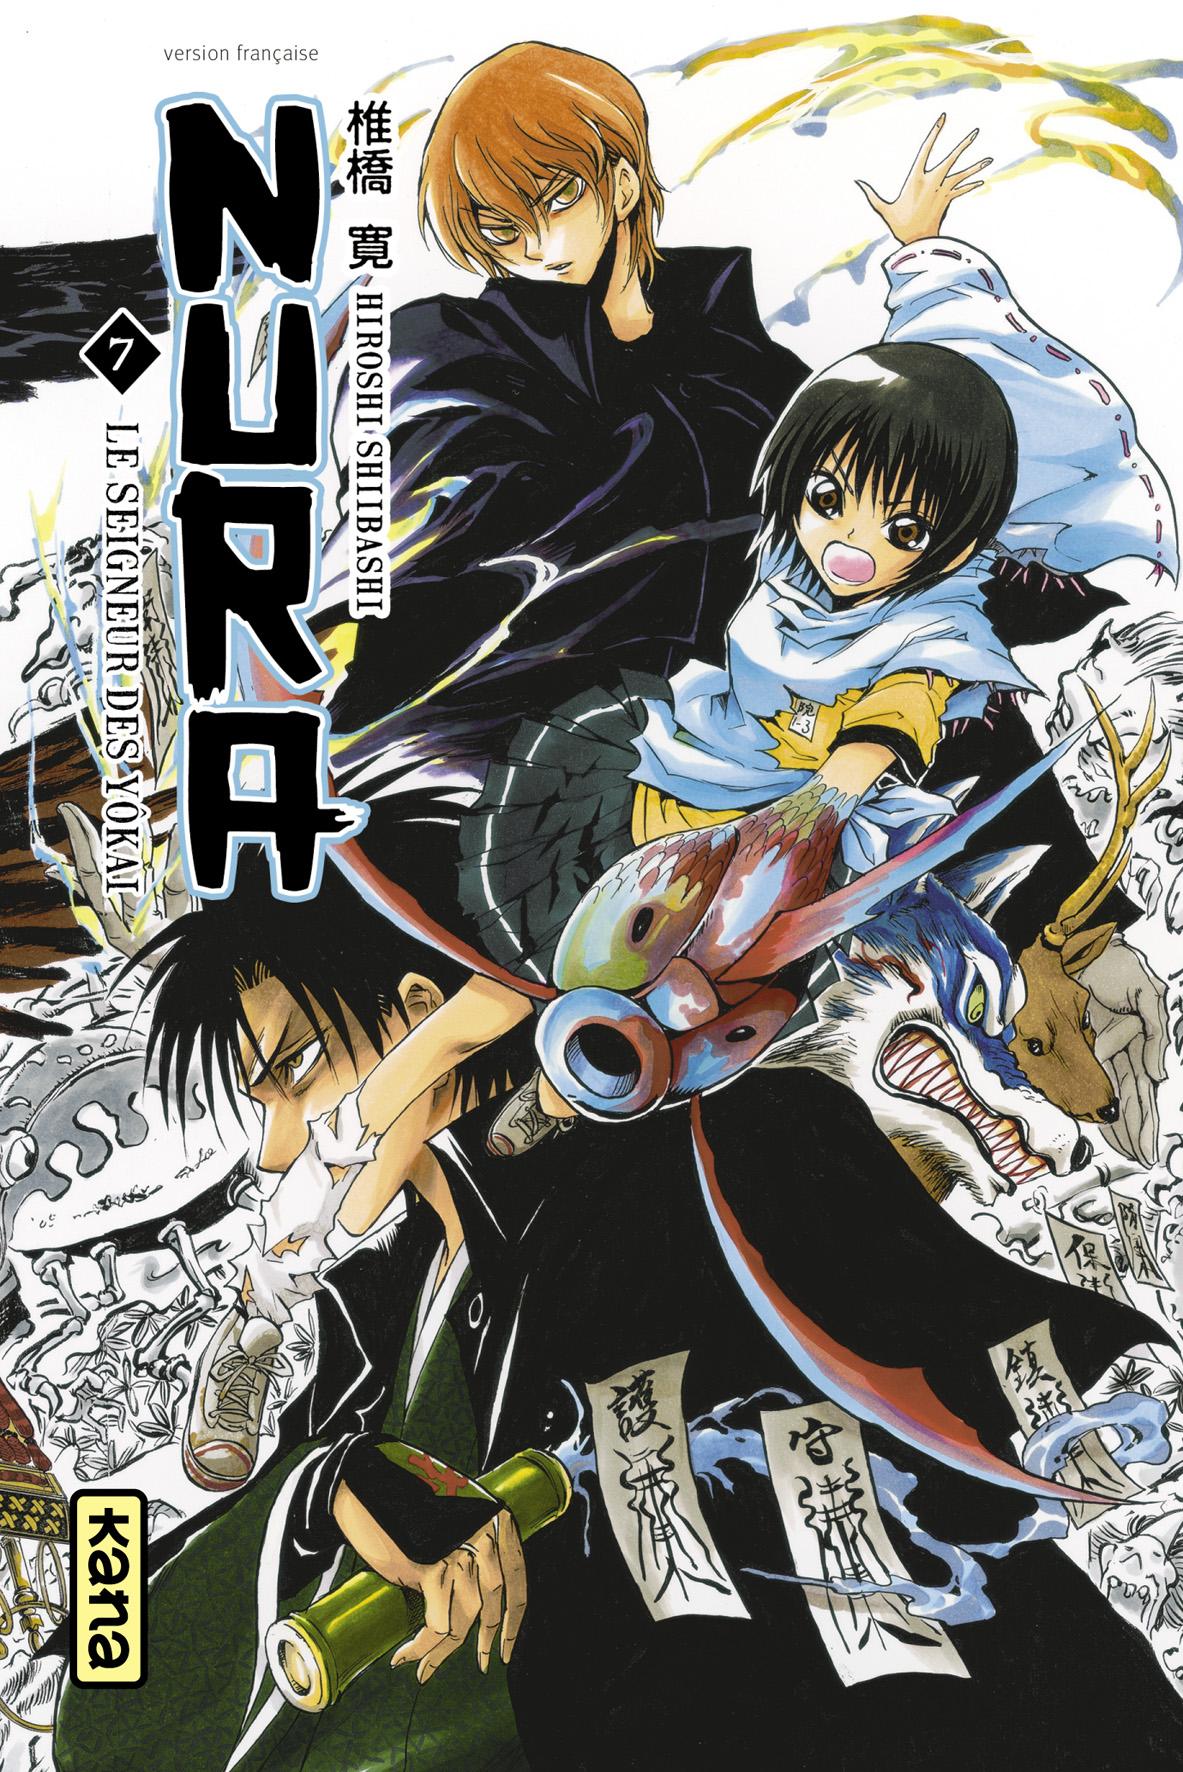 http://img.manga-sanctuary.com/big/nura-le-seigneur-des-yokai-manga-volume-7-simple-51853.jpg